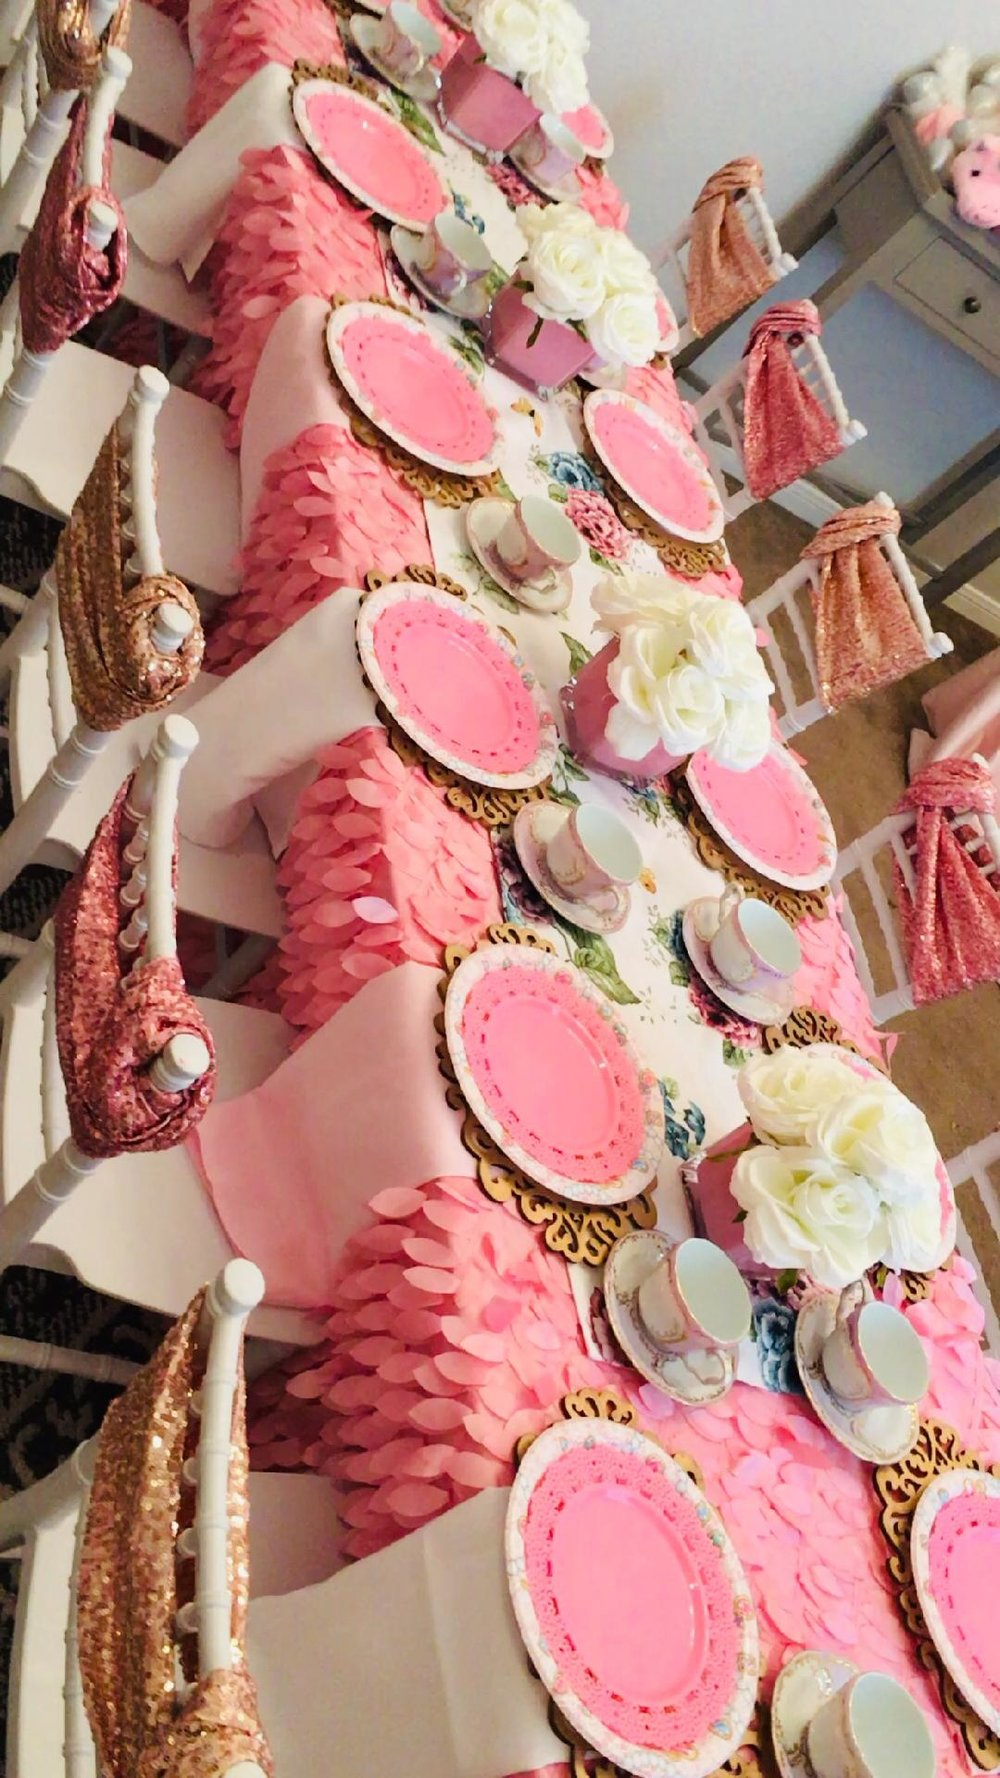 houston kids princess tea birthday party3.jpg